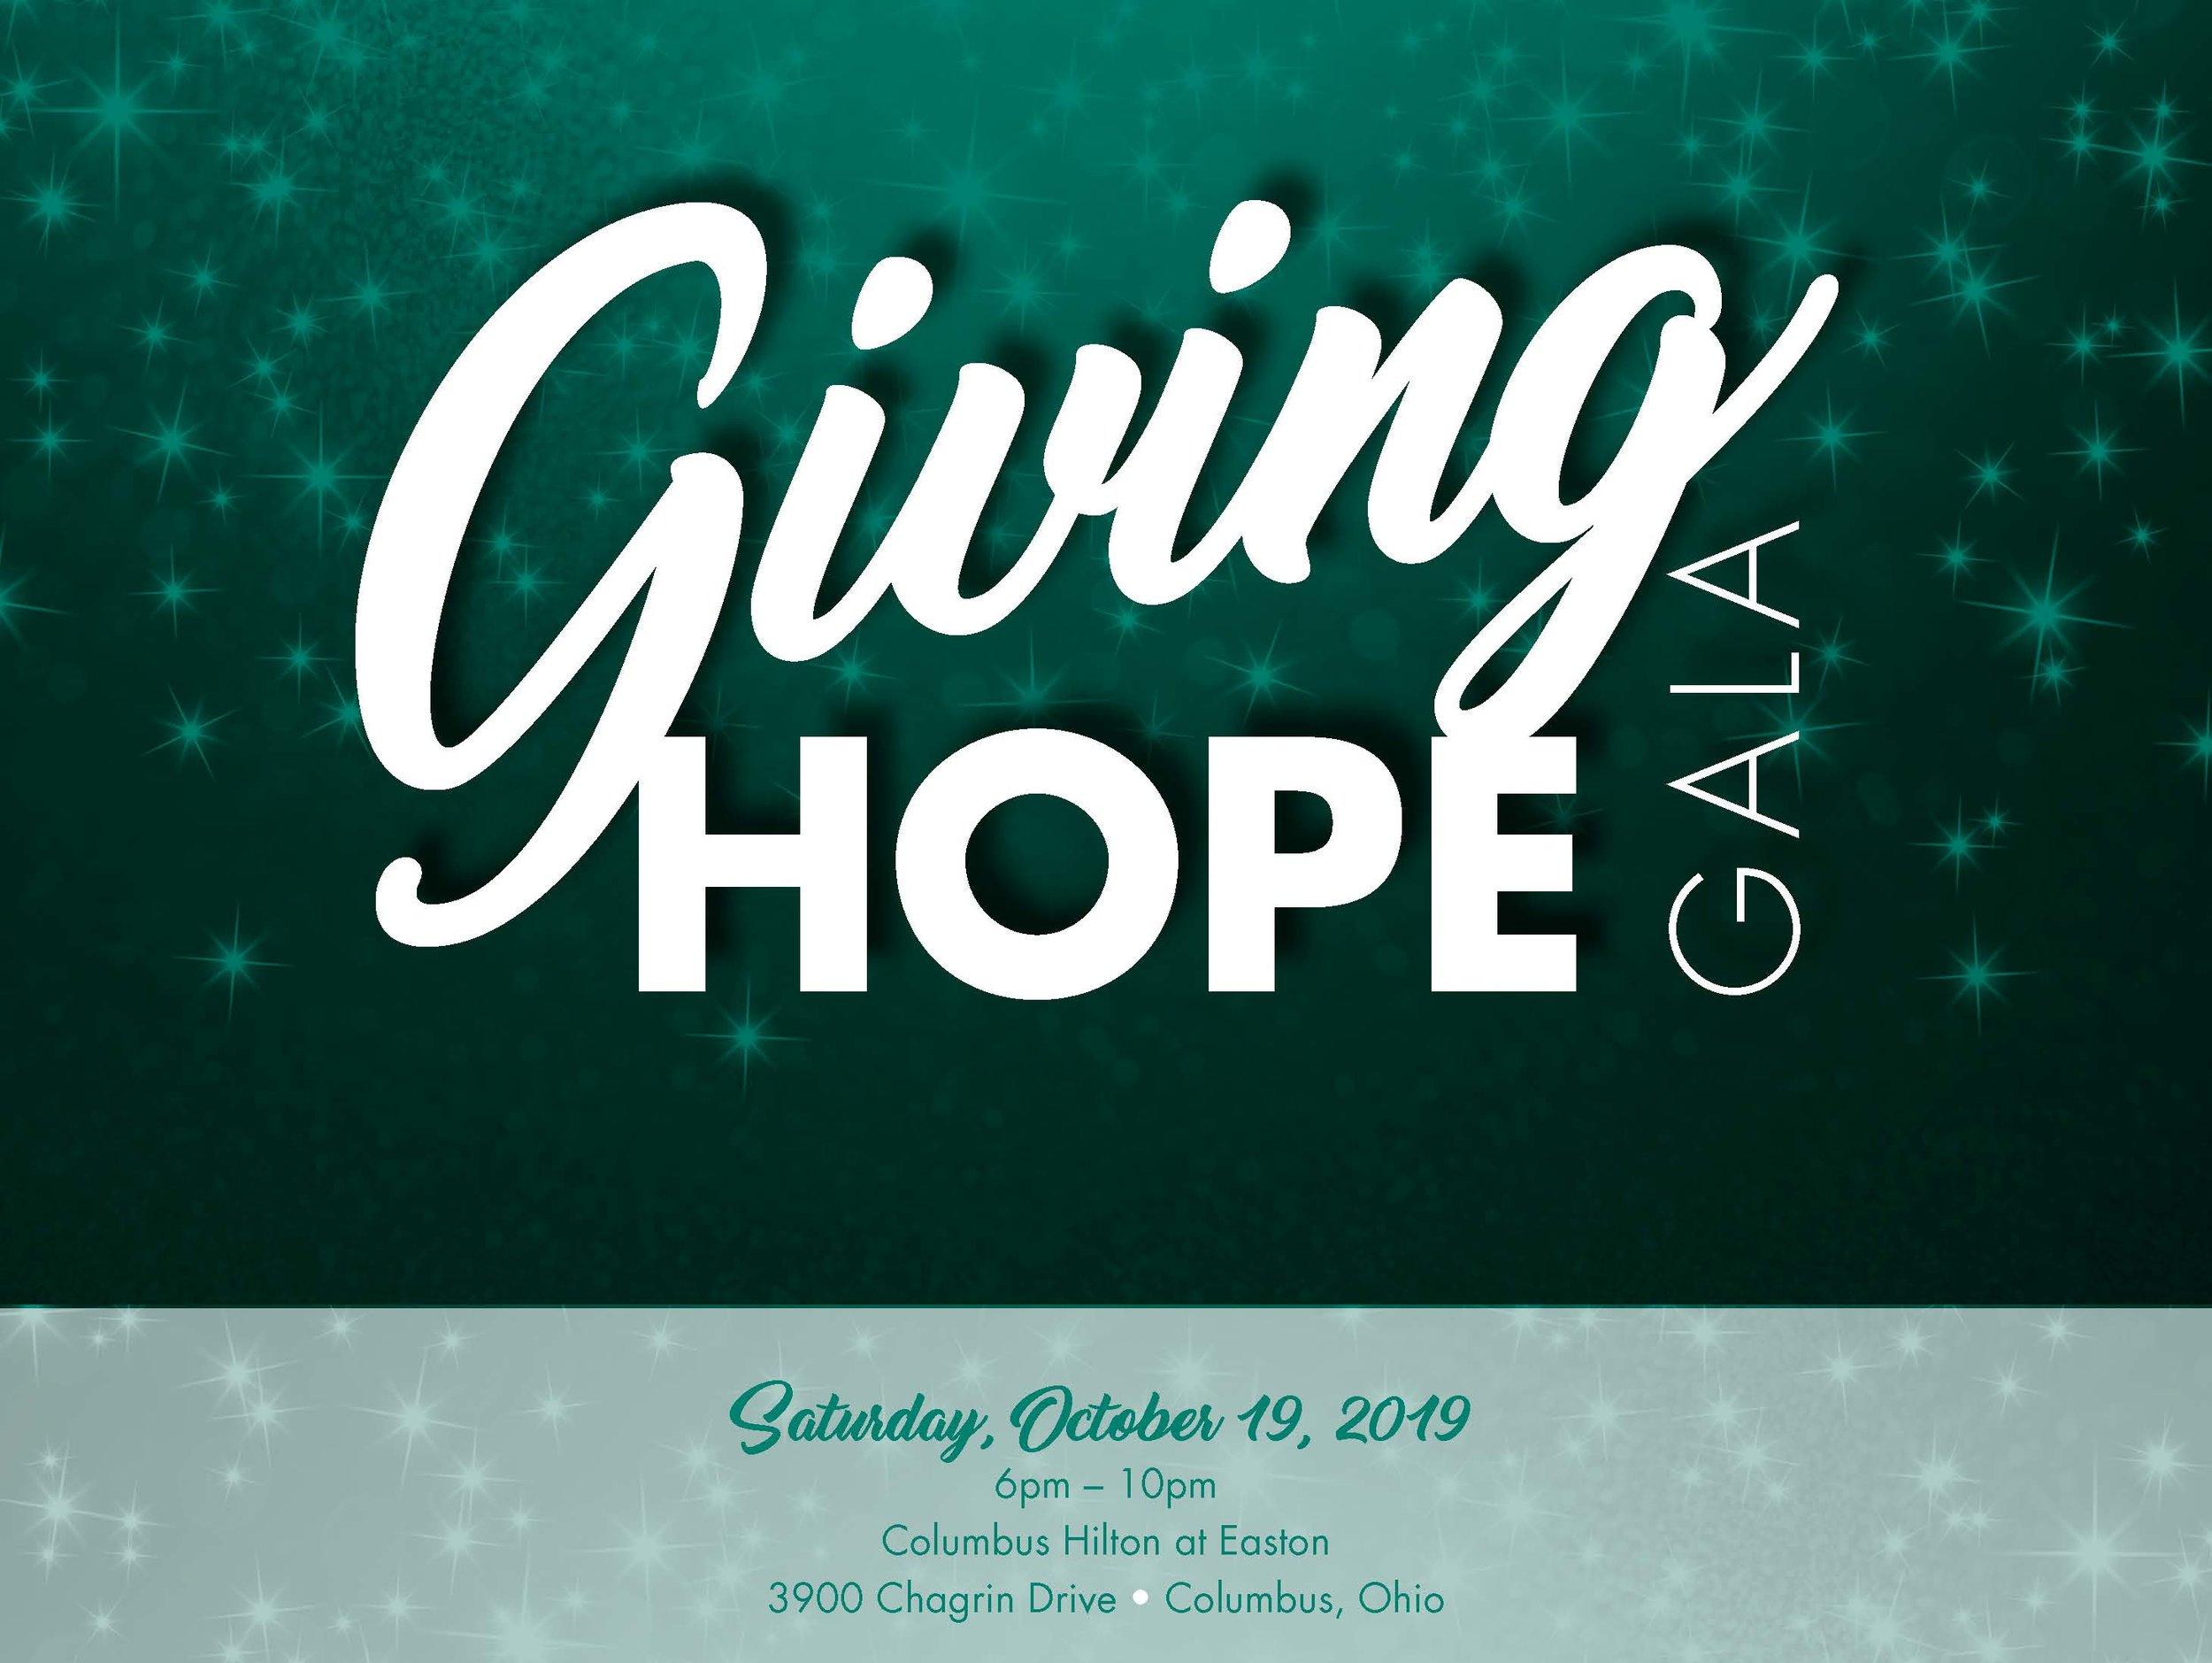 2019 Giving Hope Gala Invitation_Page_1.jpg